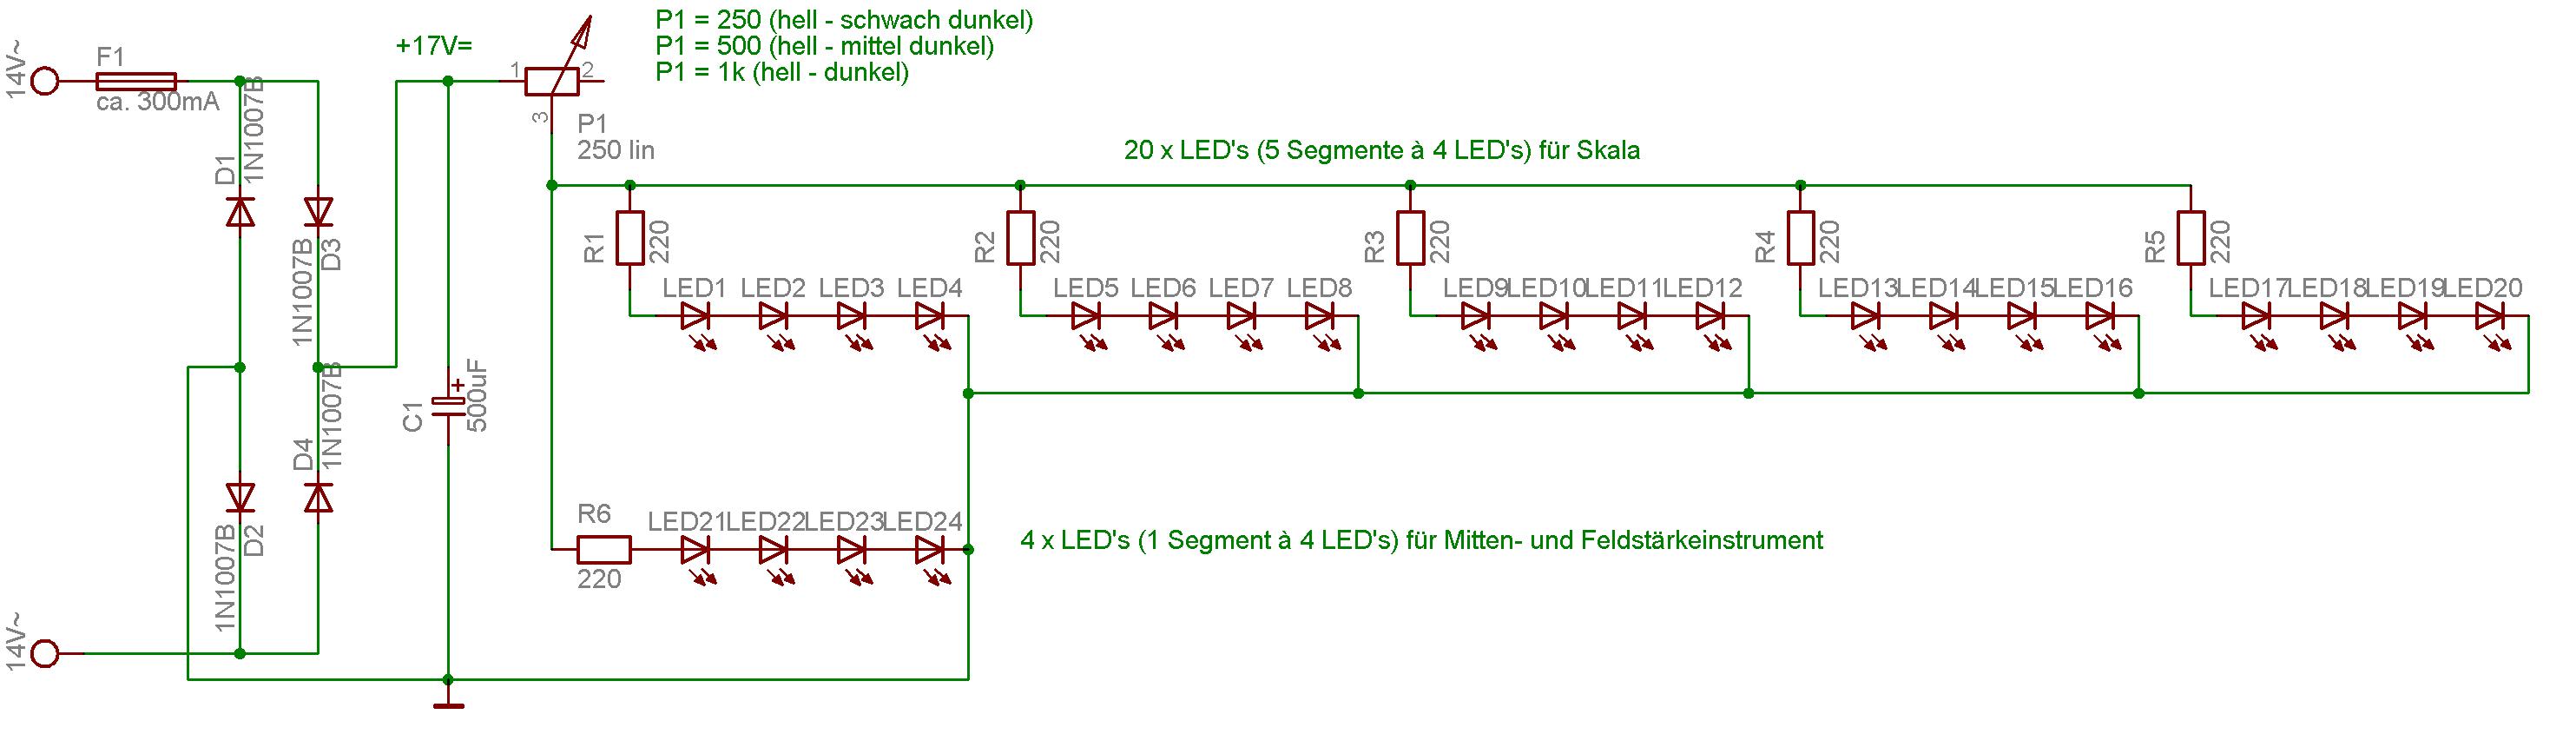 Skalenbeleuchtung Akai AA-1040 Receiver